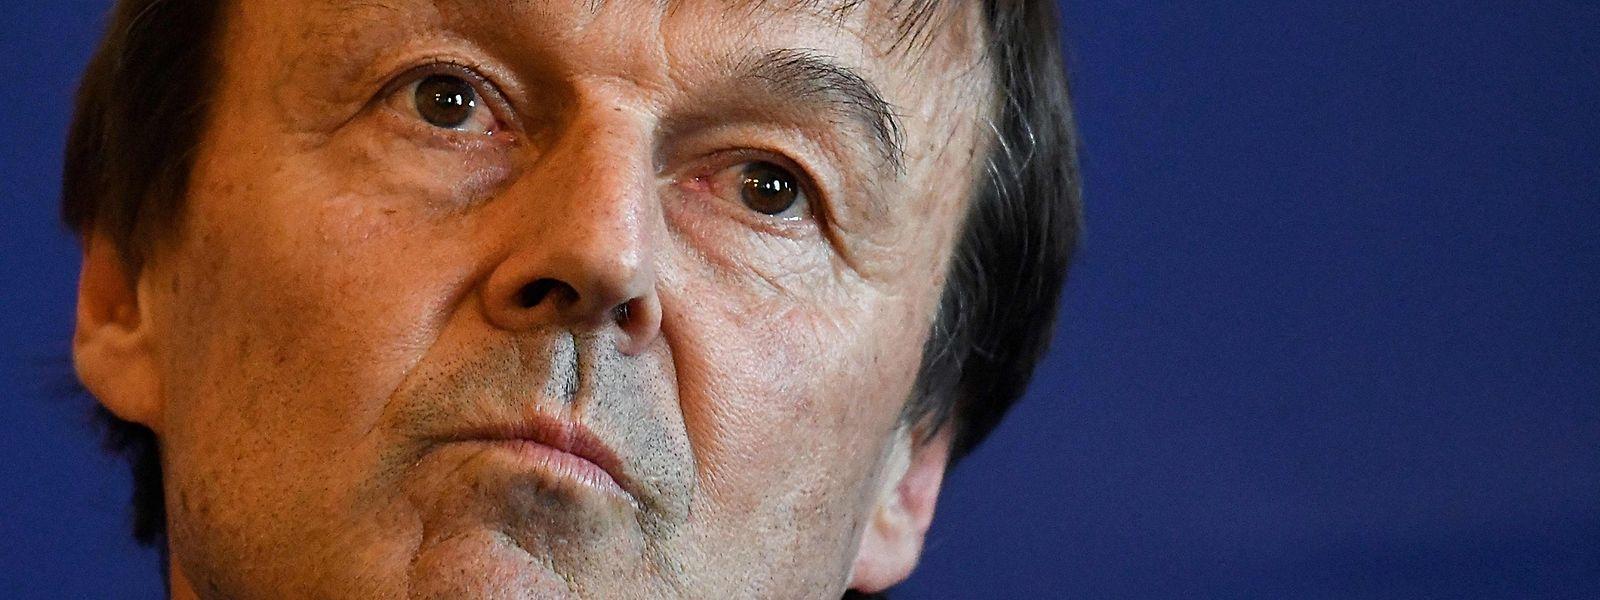 Nicolas Hulot kündigte am Dienstag seinen Rücktritt an.